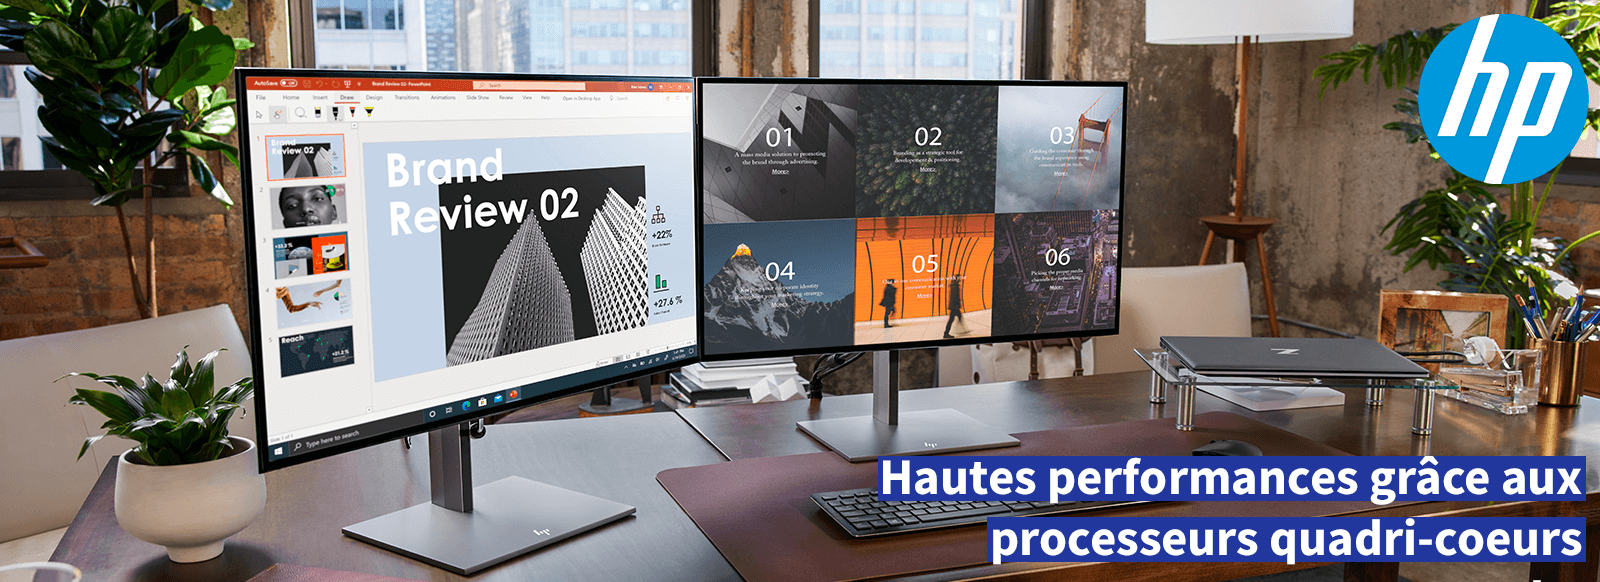 Banner HP Zbook Firefly - Processor performance - Darest